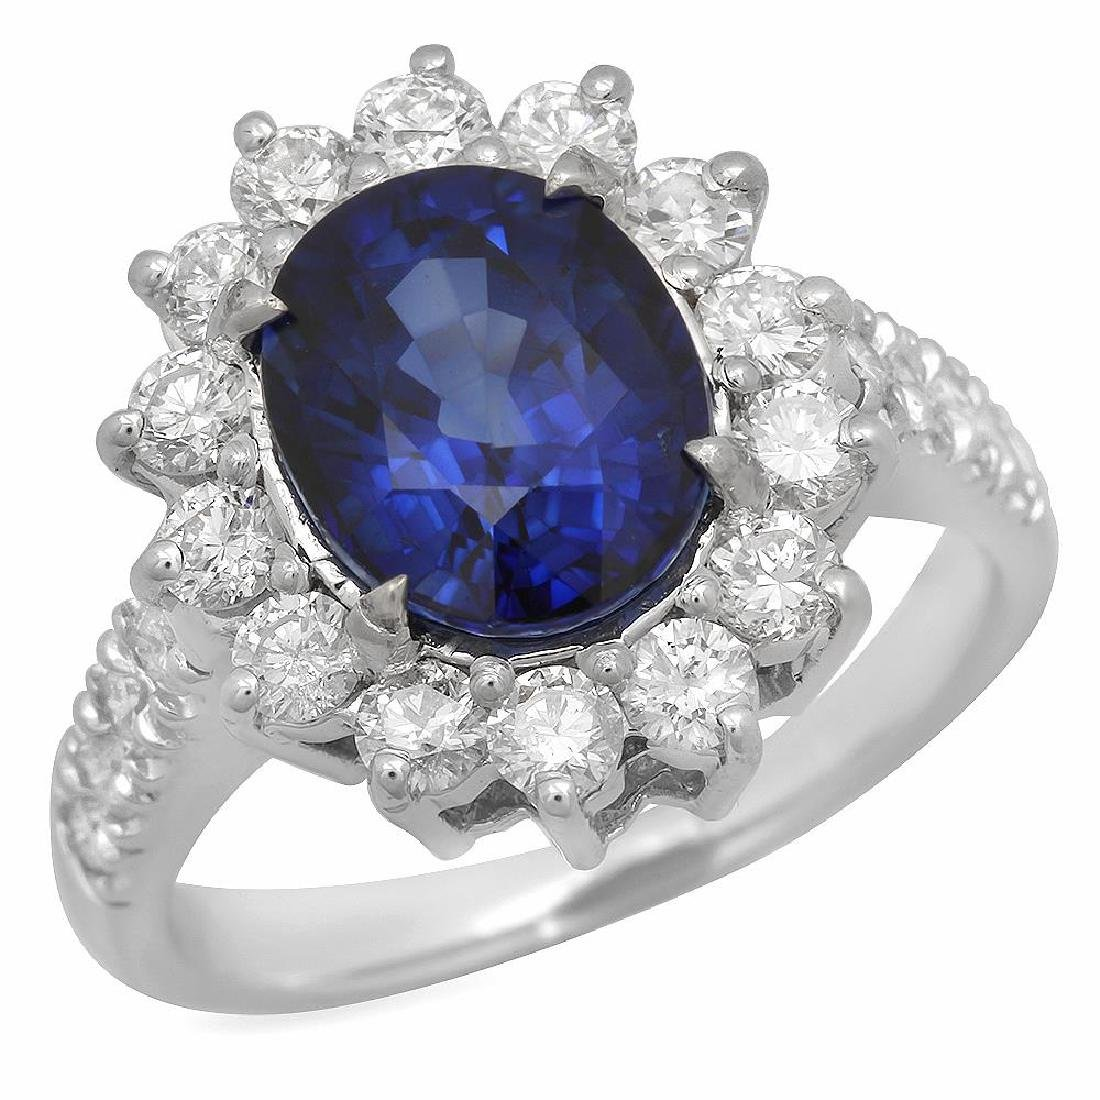 14K Gold 2.51ct Sapphire 1.15ct Diamond Ring